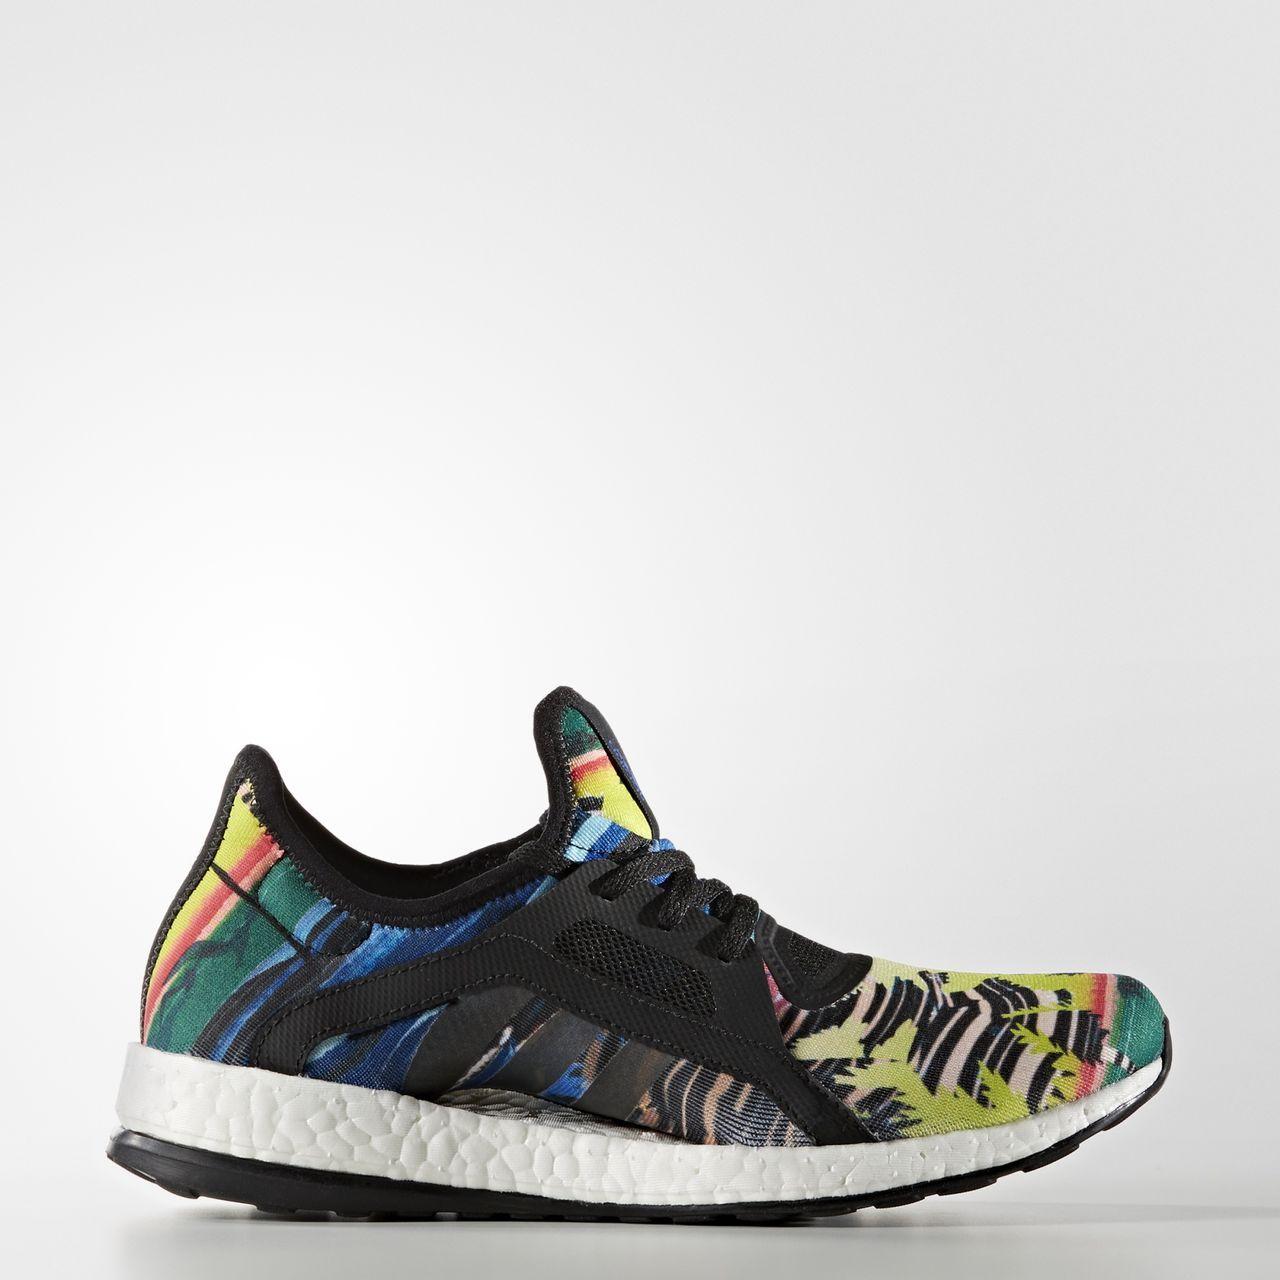 Buscar 68872 3d37e zapatilla Adidas Pure Boost corriendo zapatos Pinterest